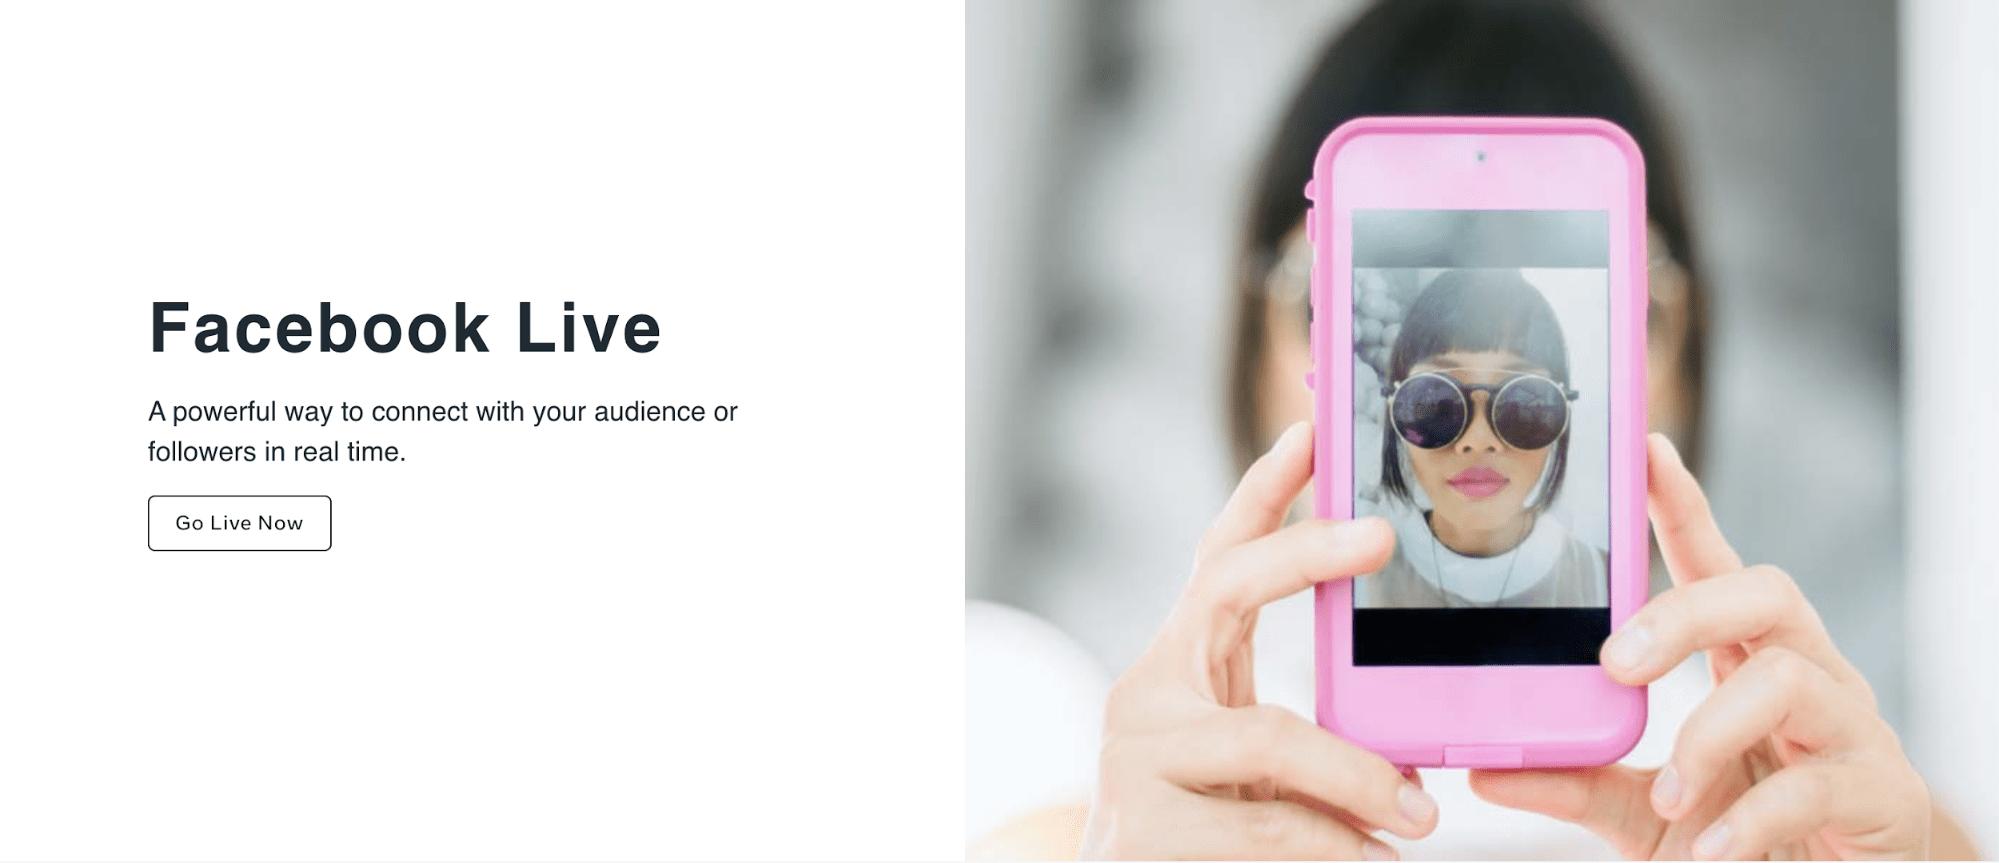 Facebook Live - Virtual event tools